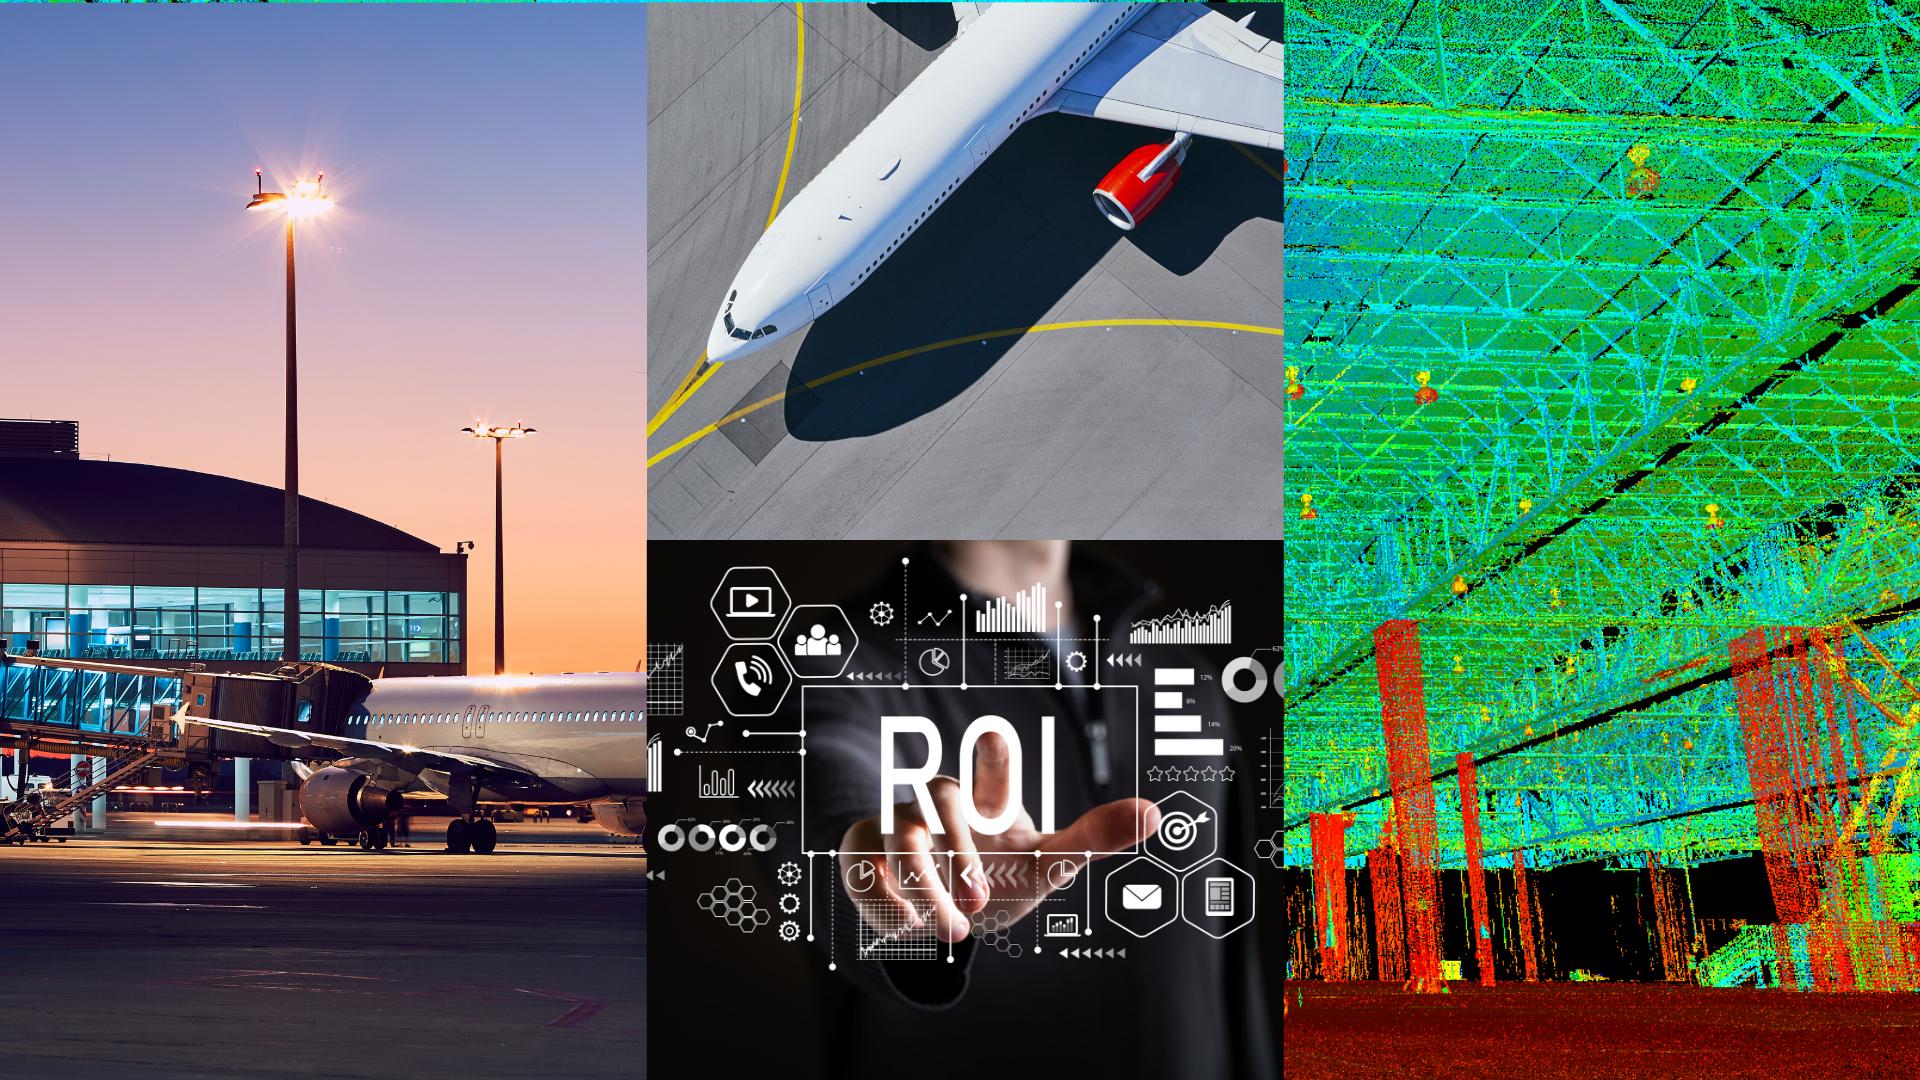 cci_blog_Airport-and-BIM-ROI